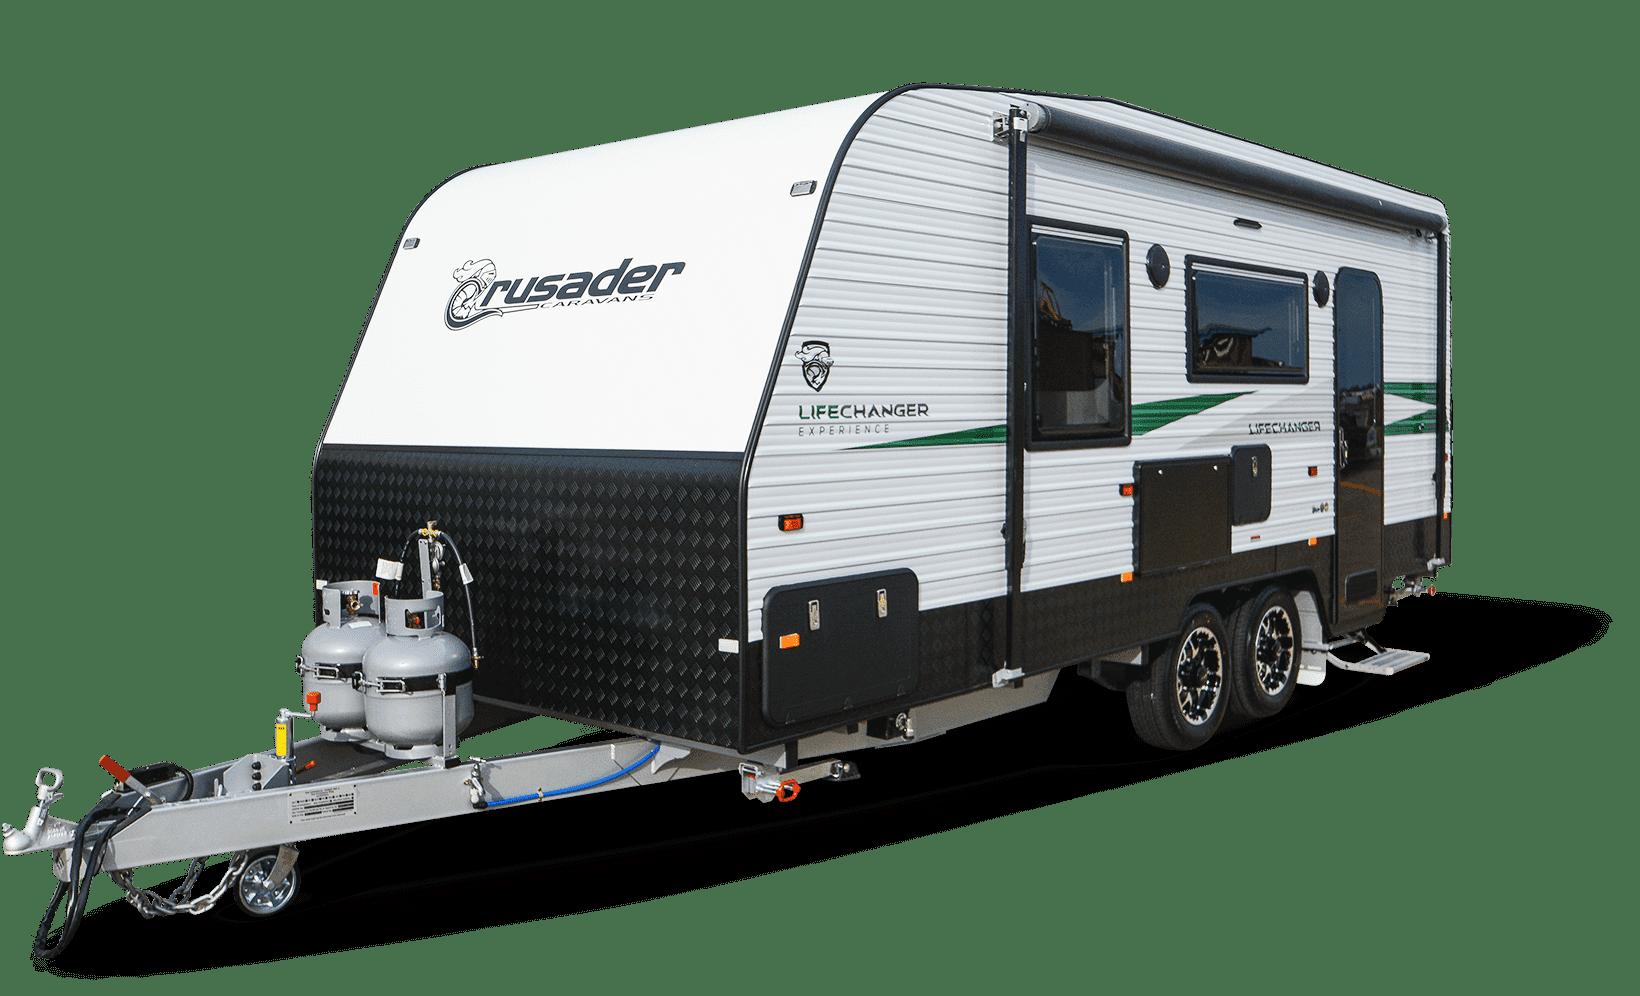 Image of new Crusader caravan named Lifechanger Experience.